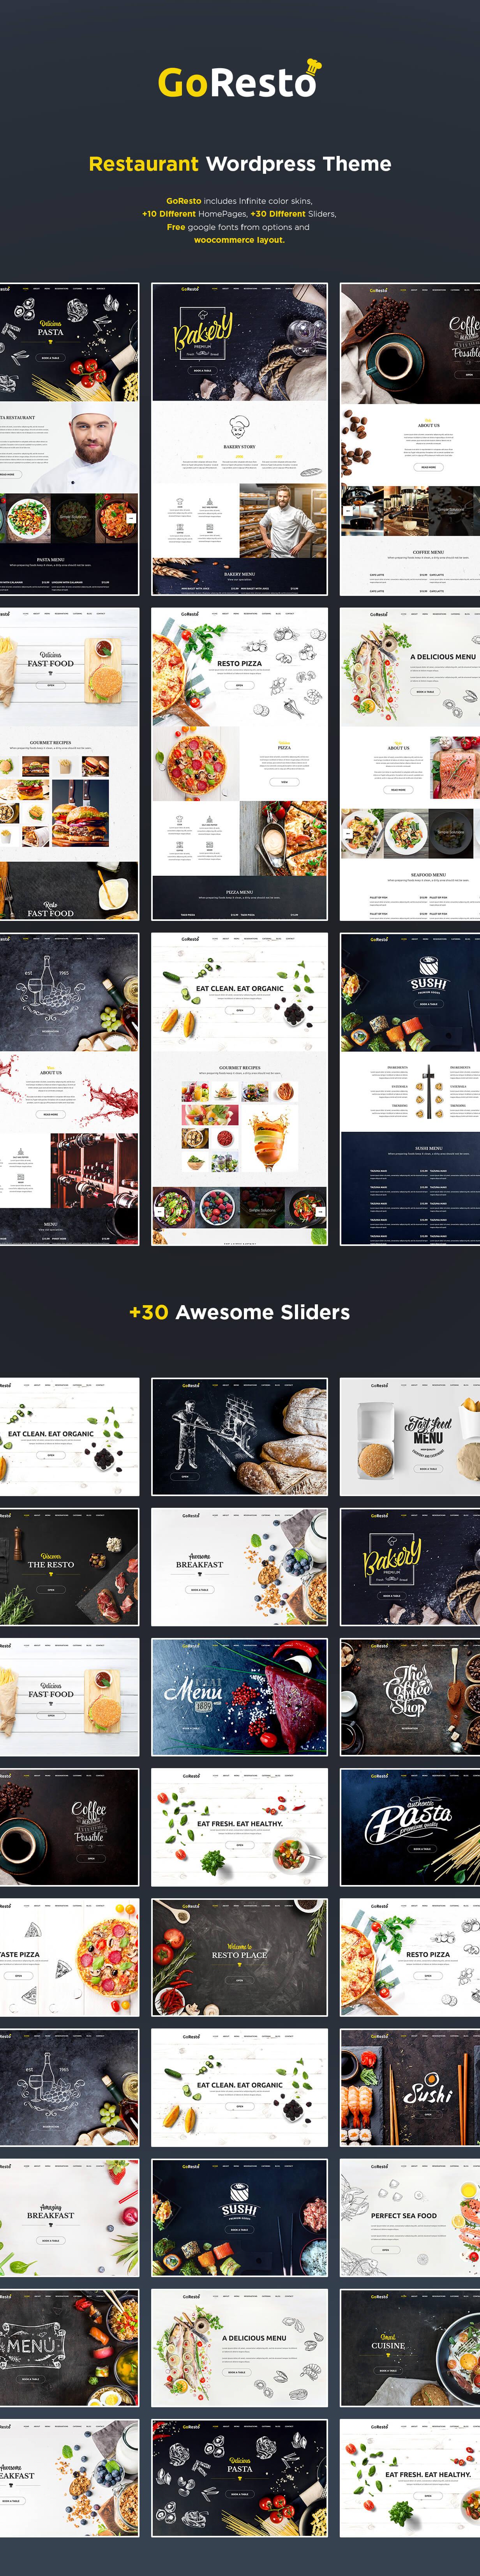 GoResto - Restaurant Food Delivery WordPress Theme - 1